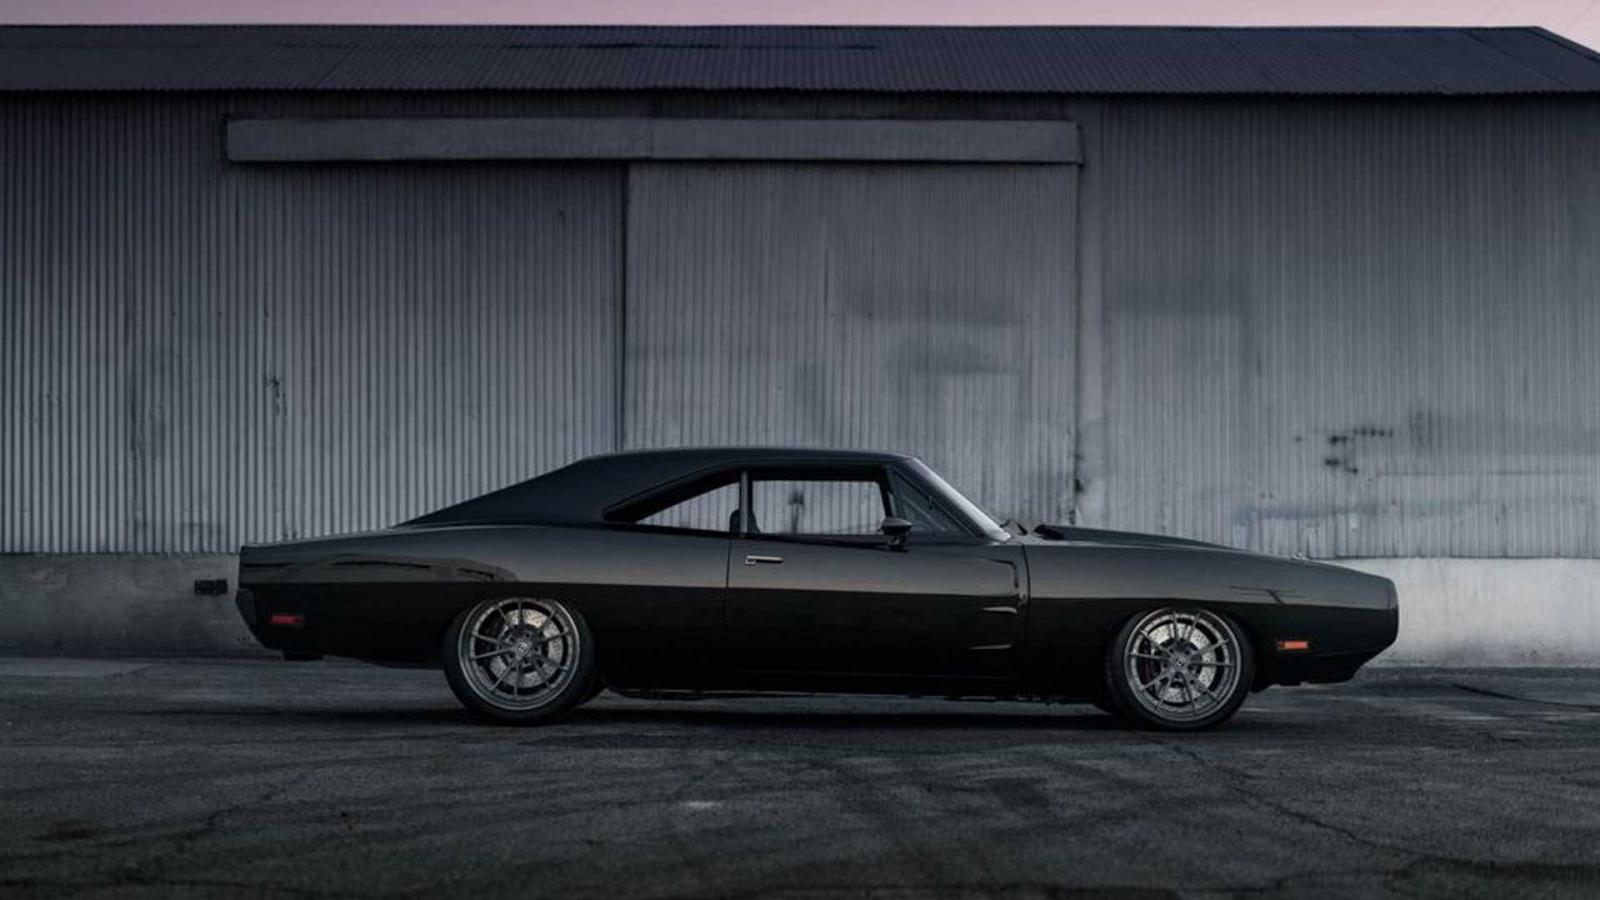 Vin Diesel recibe de cumpleaños un Dodge Charger 1970